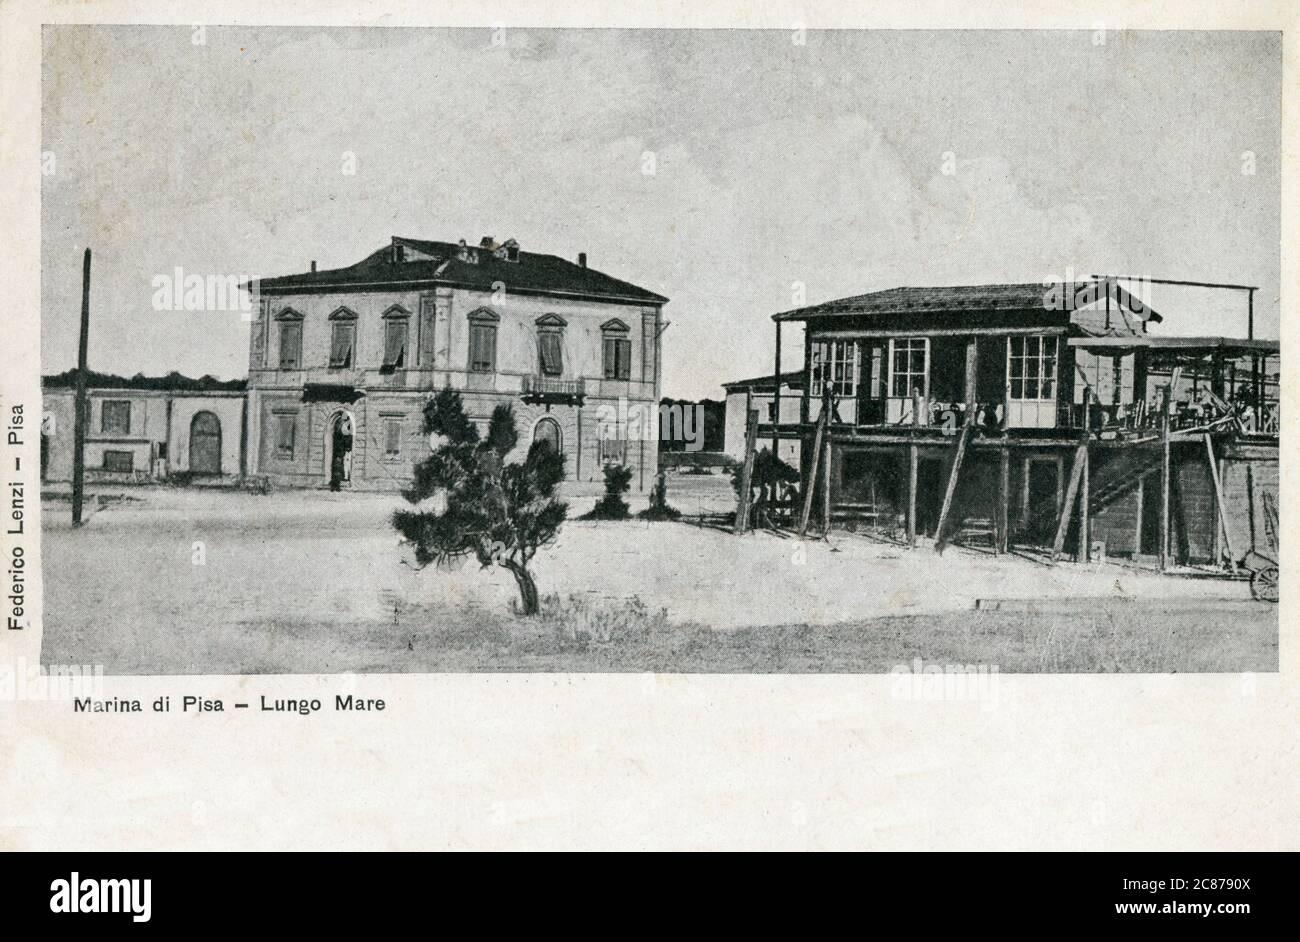 Marina di Pisa, Italy - Lungomare.     Date: 1904 Stock Photo